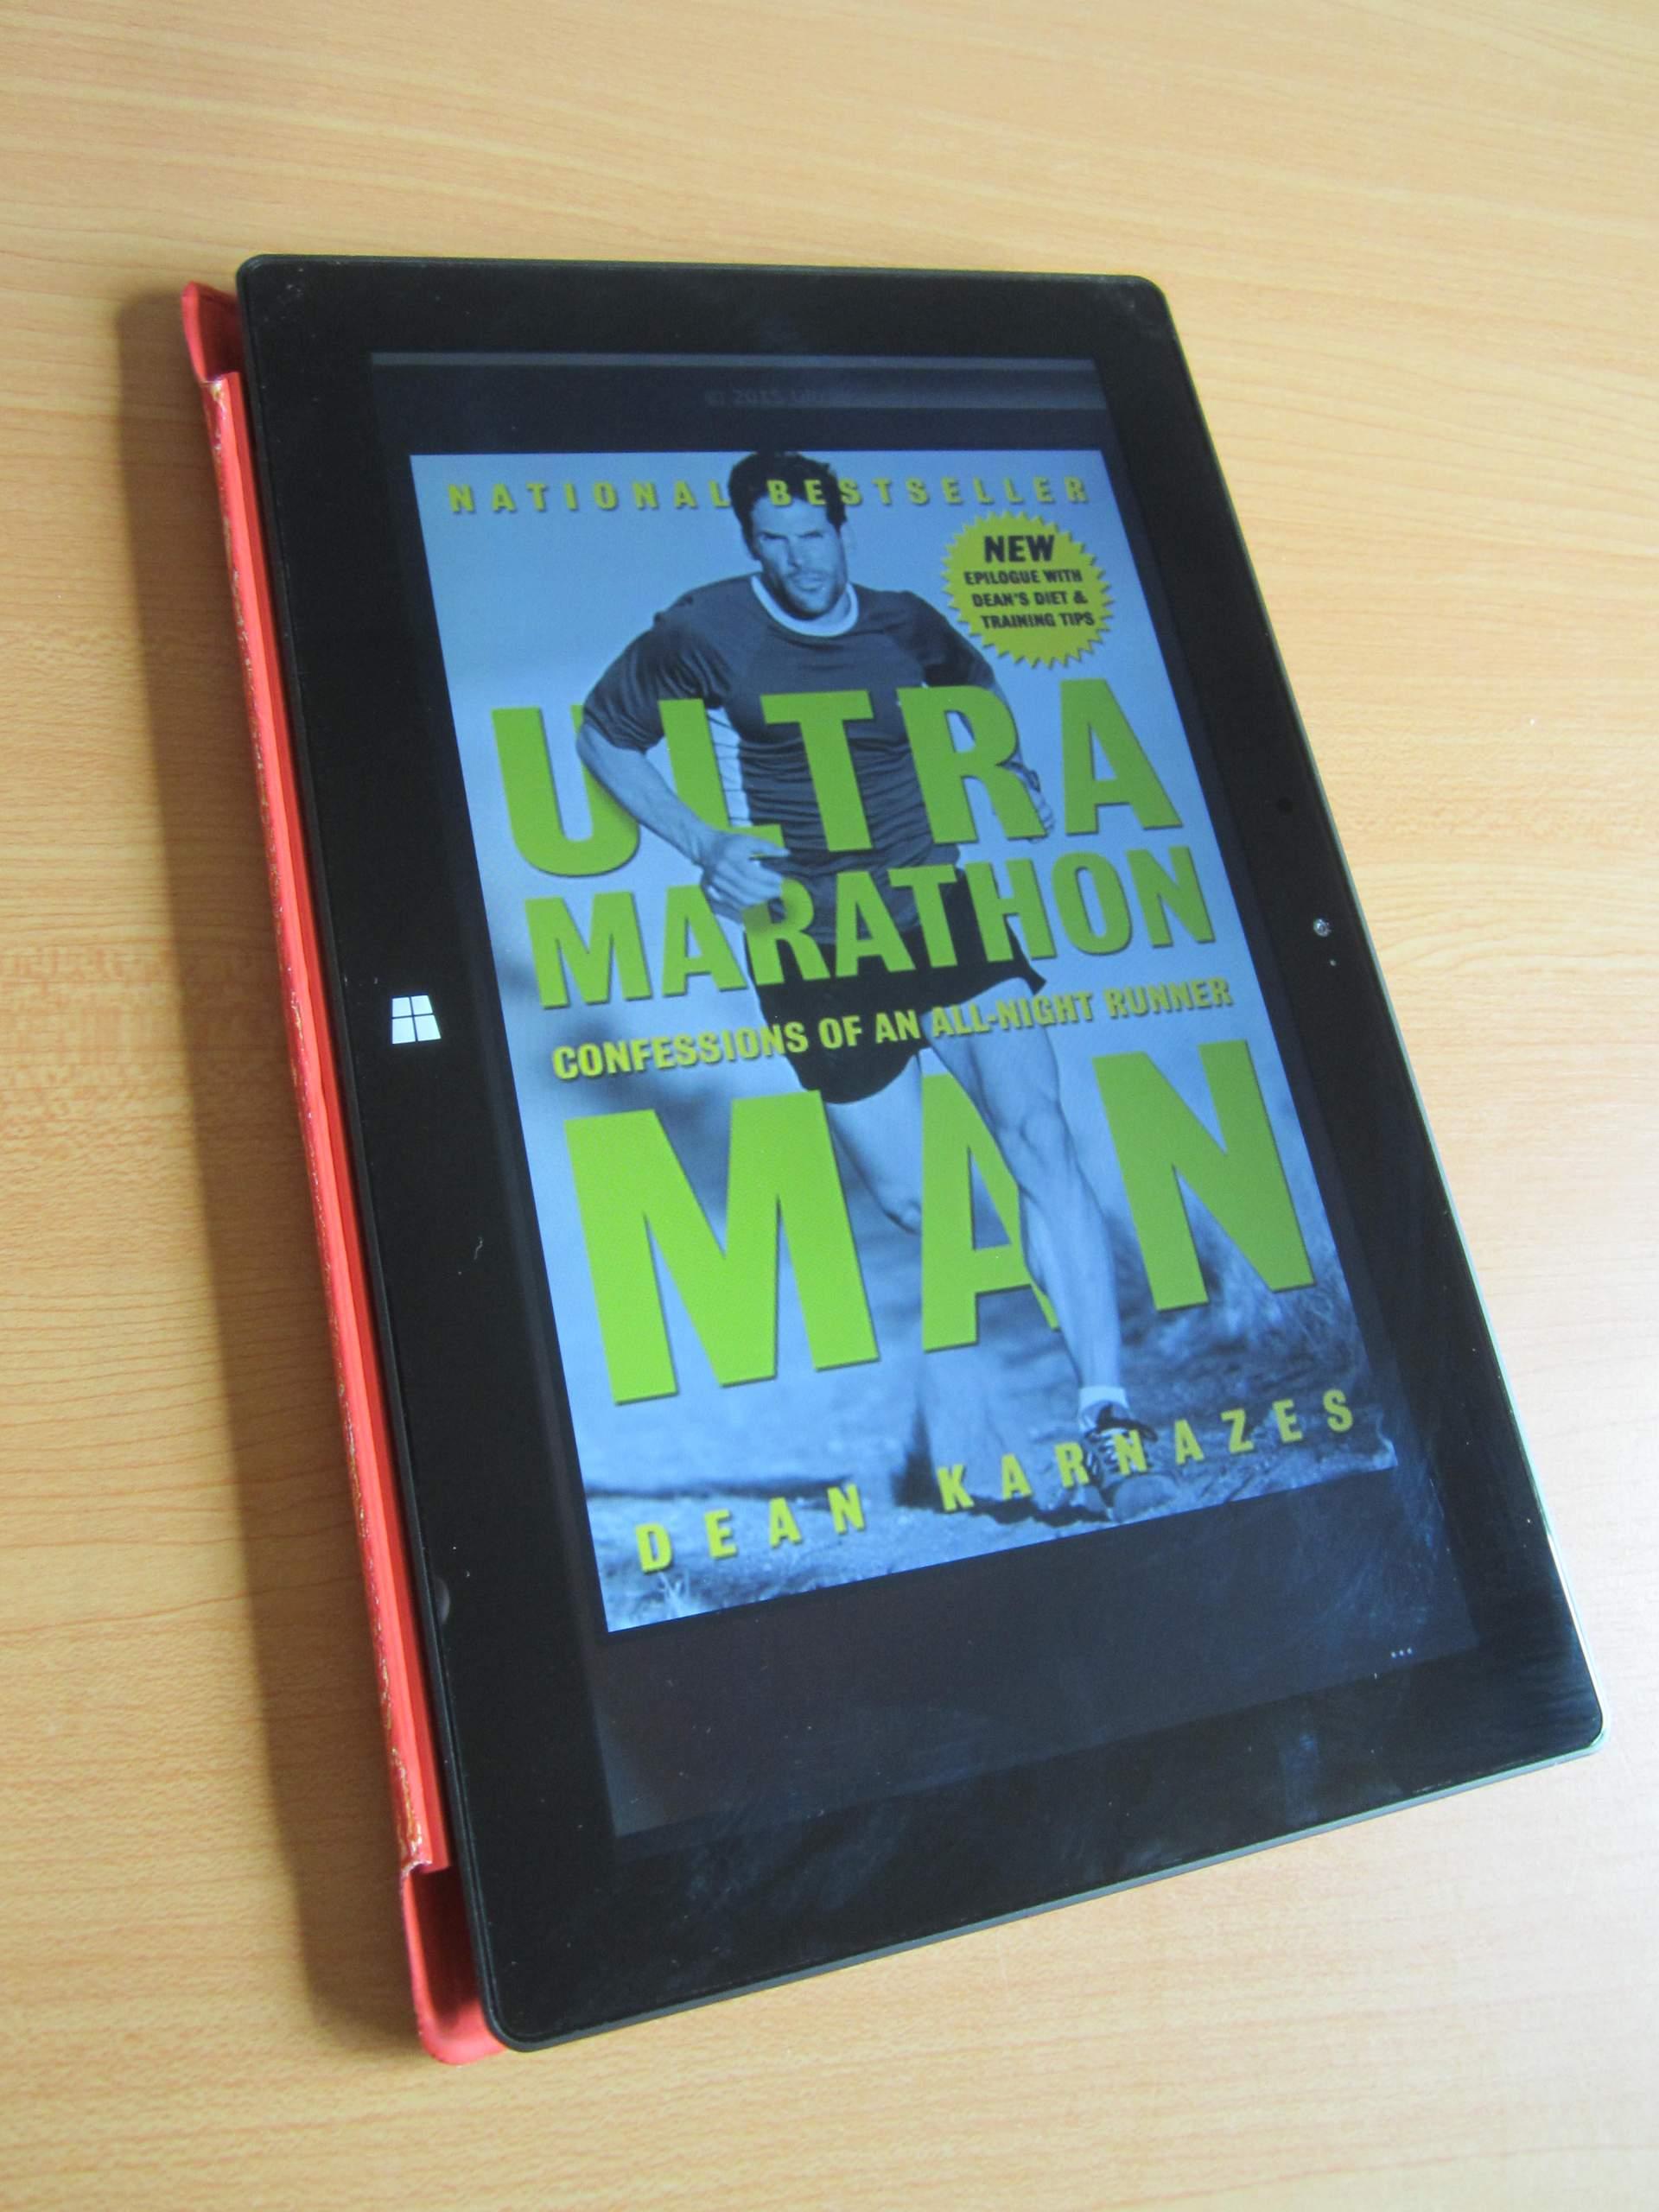 Ultramarathon Man ebook, Dean Karnazes